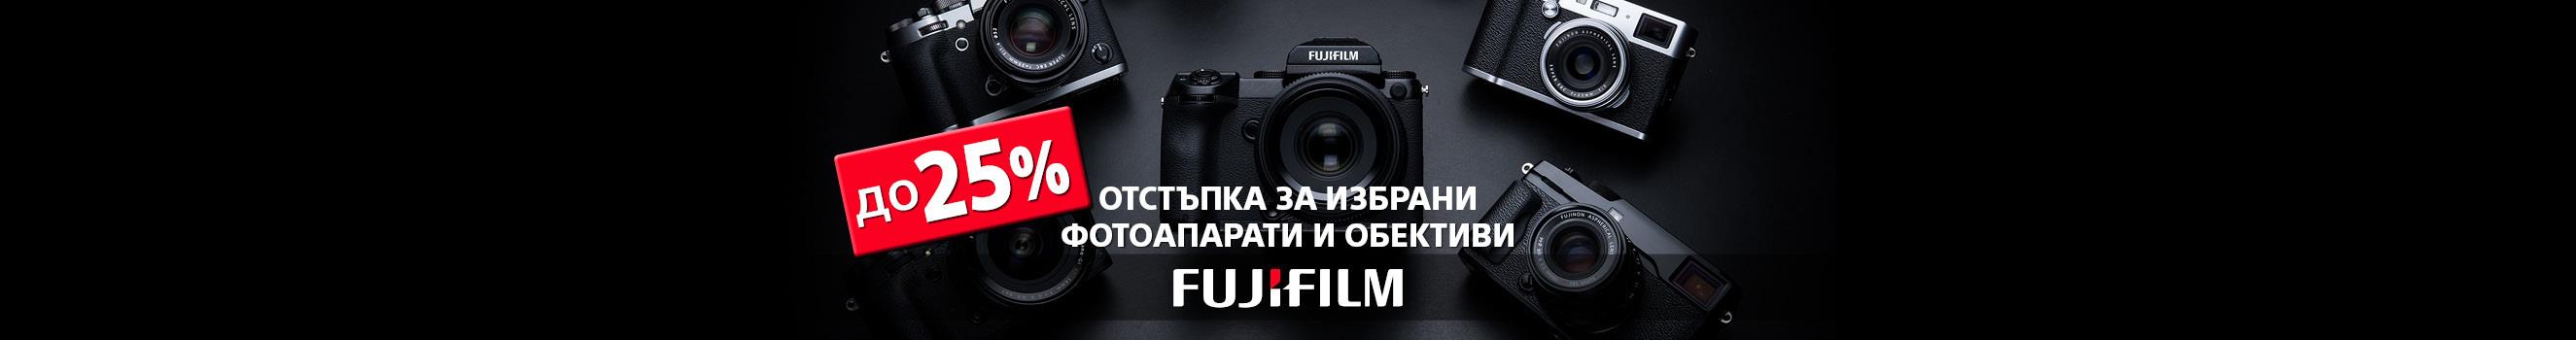 Фотоапарати и обективи Fujifilm с до -25% отстъпка